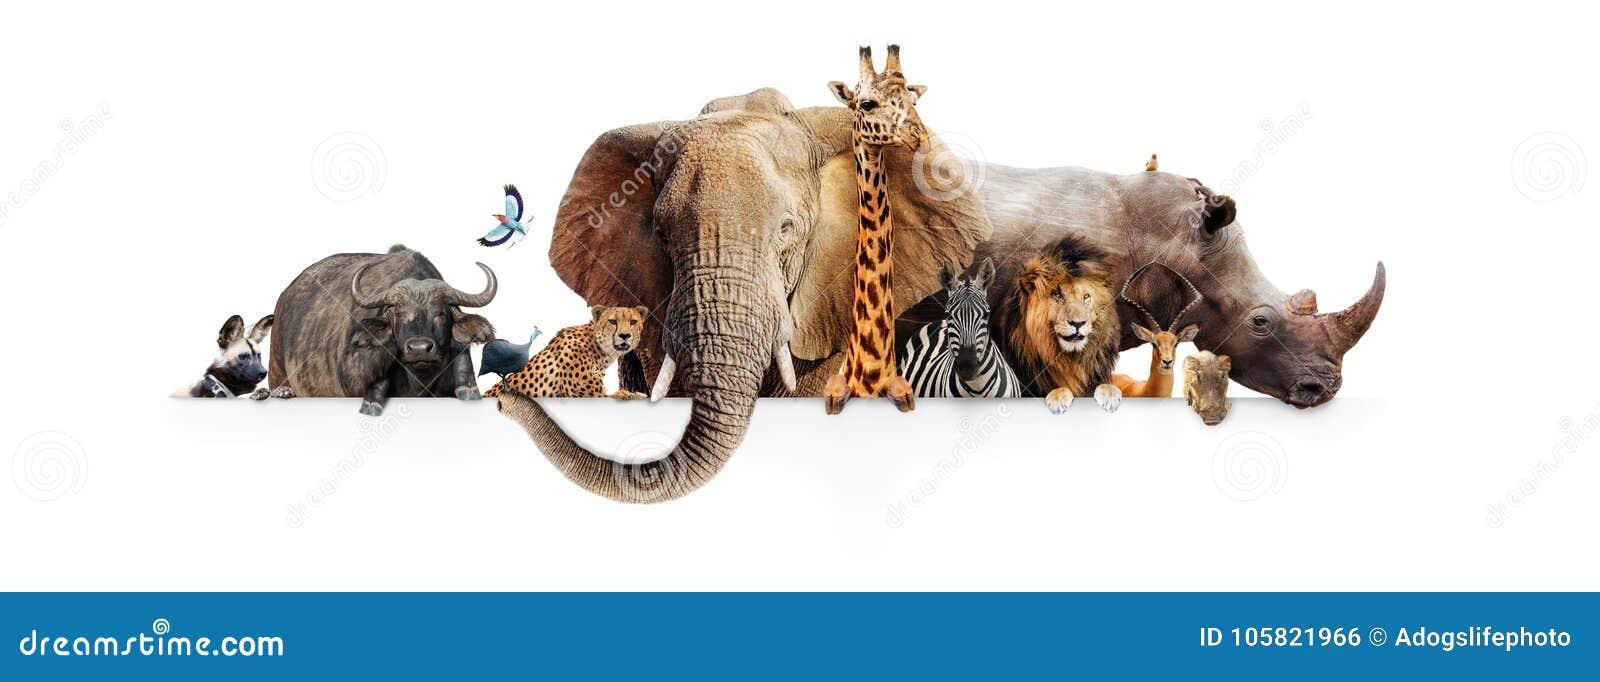 Bandera de Safari Animals Hanging Over White